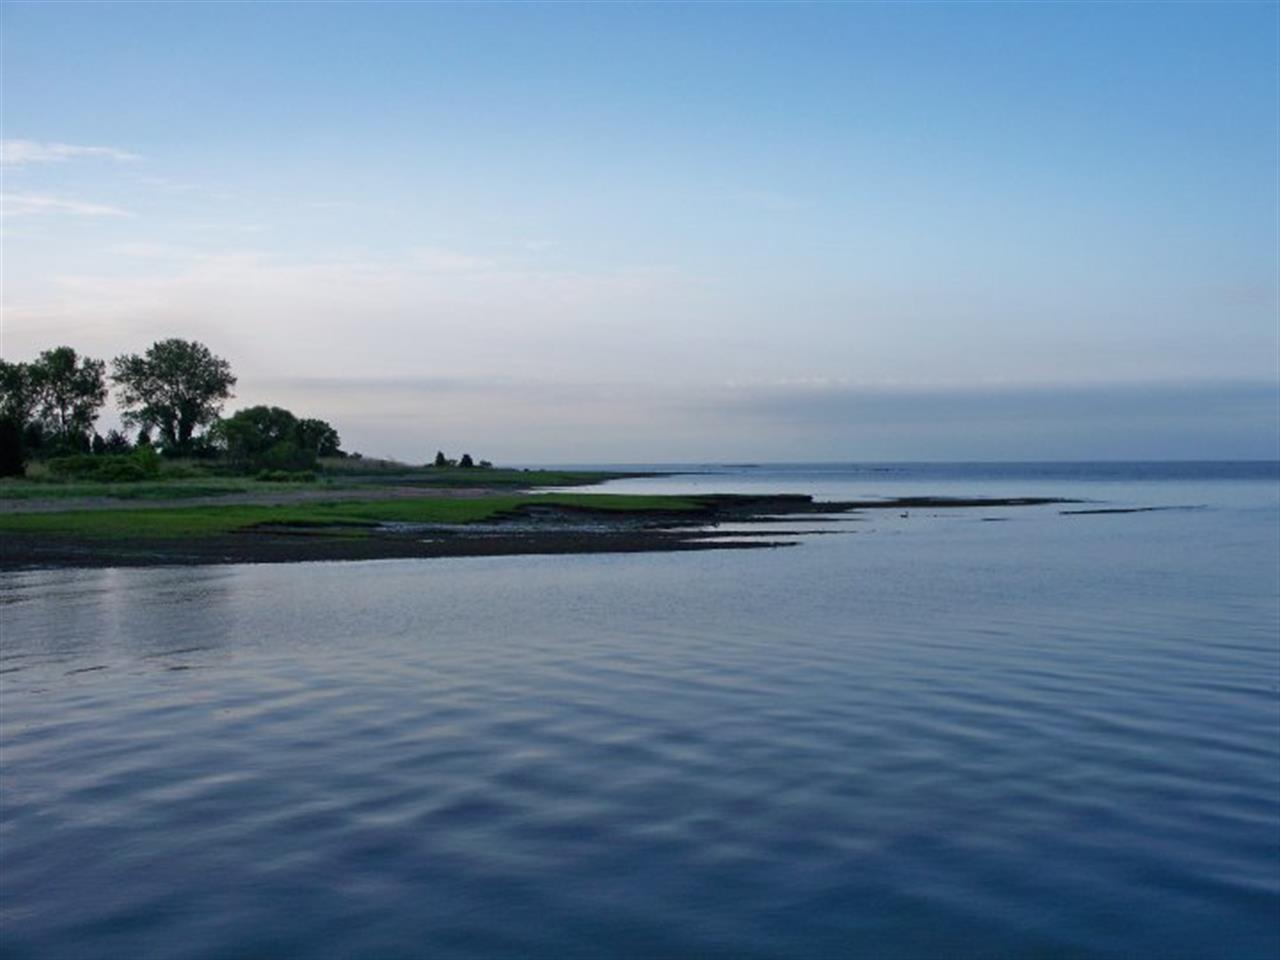 #Guilford #Guilford Harbor #GrassIsland